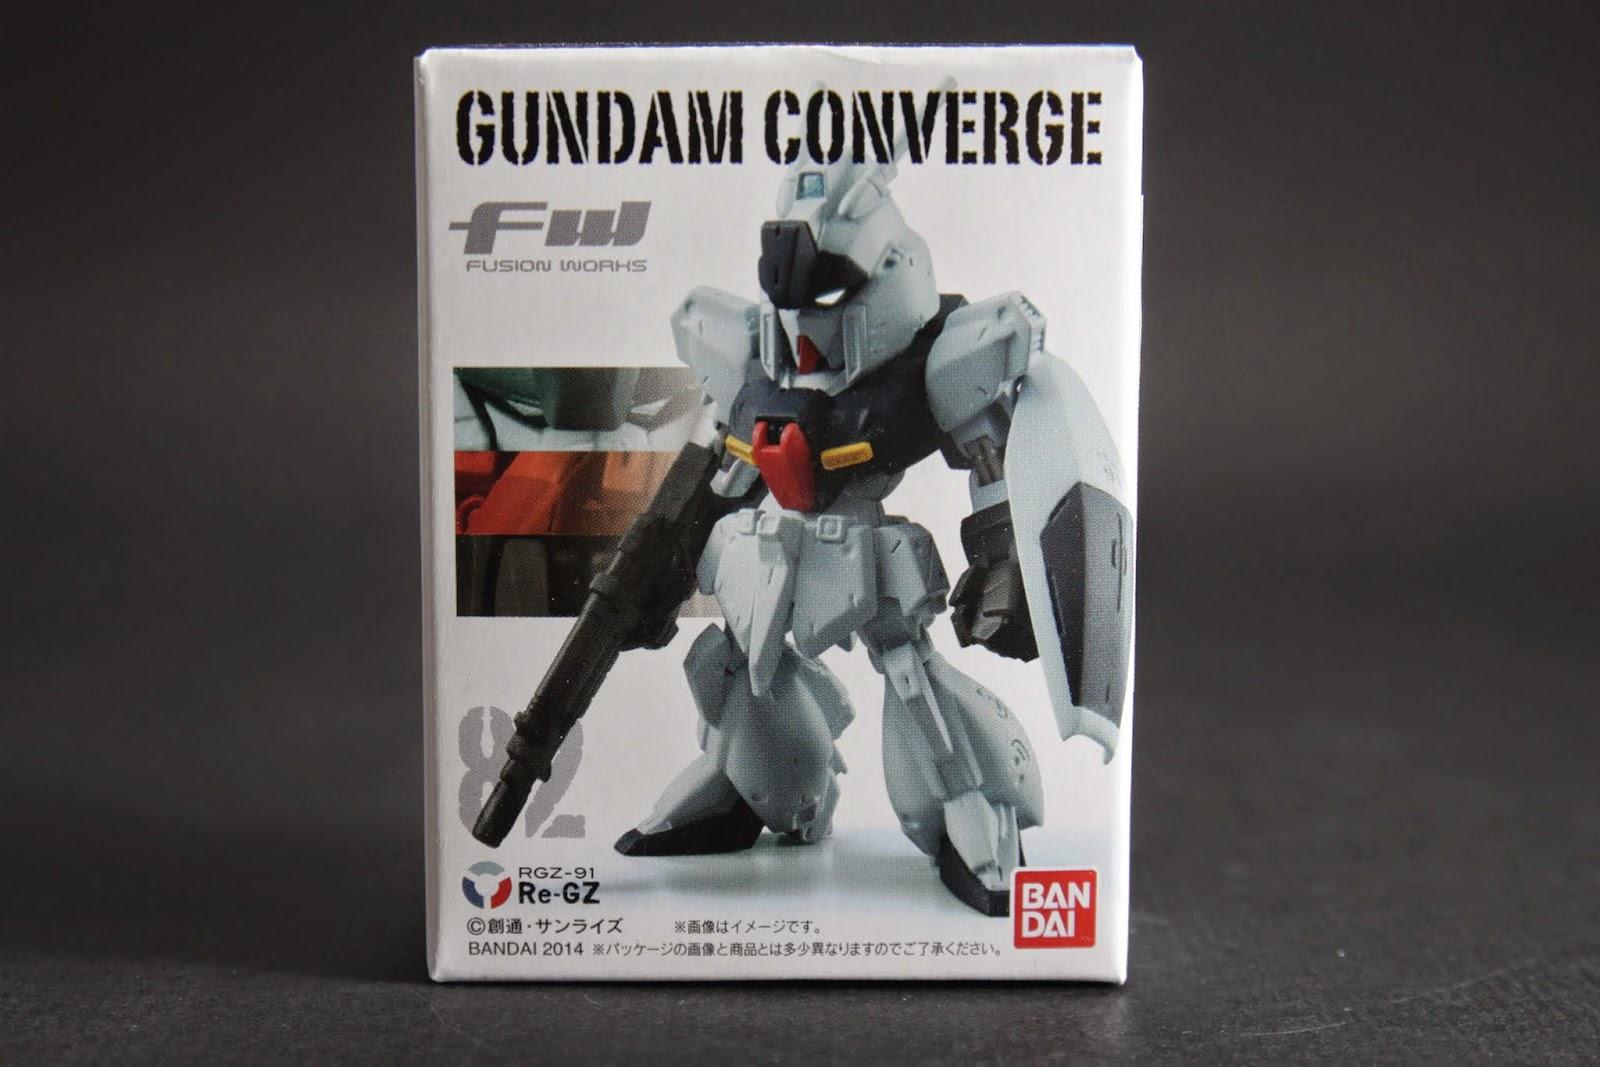 RGZ-91 Re-GZ Z Gundam的發展型簡易量產機